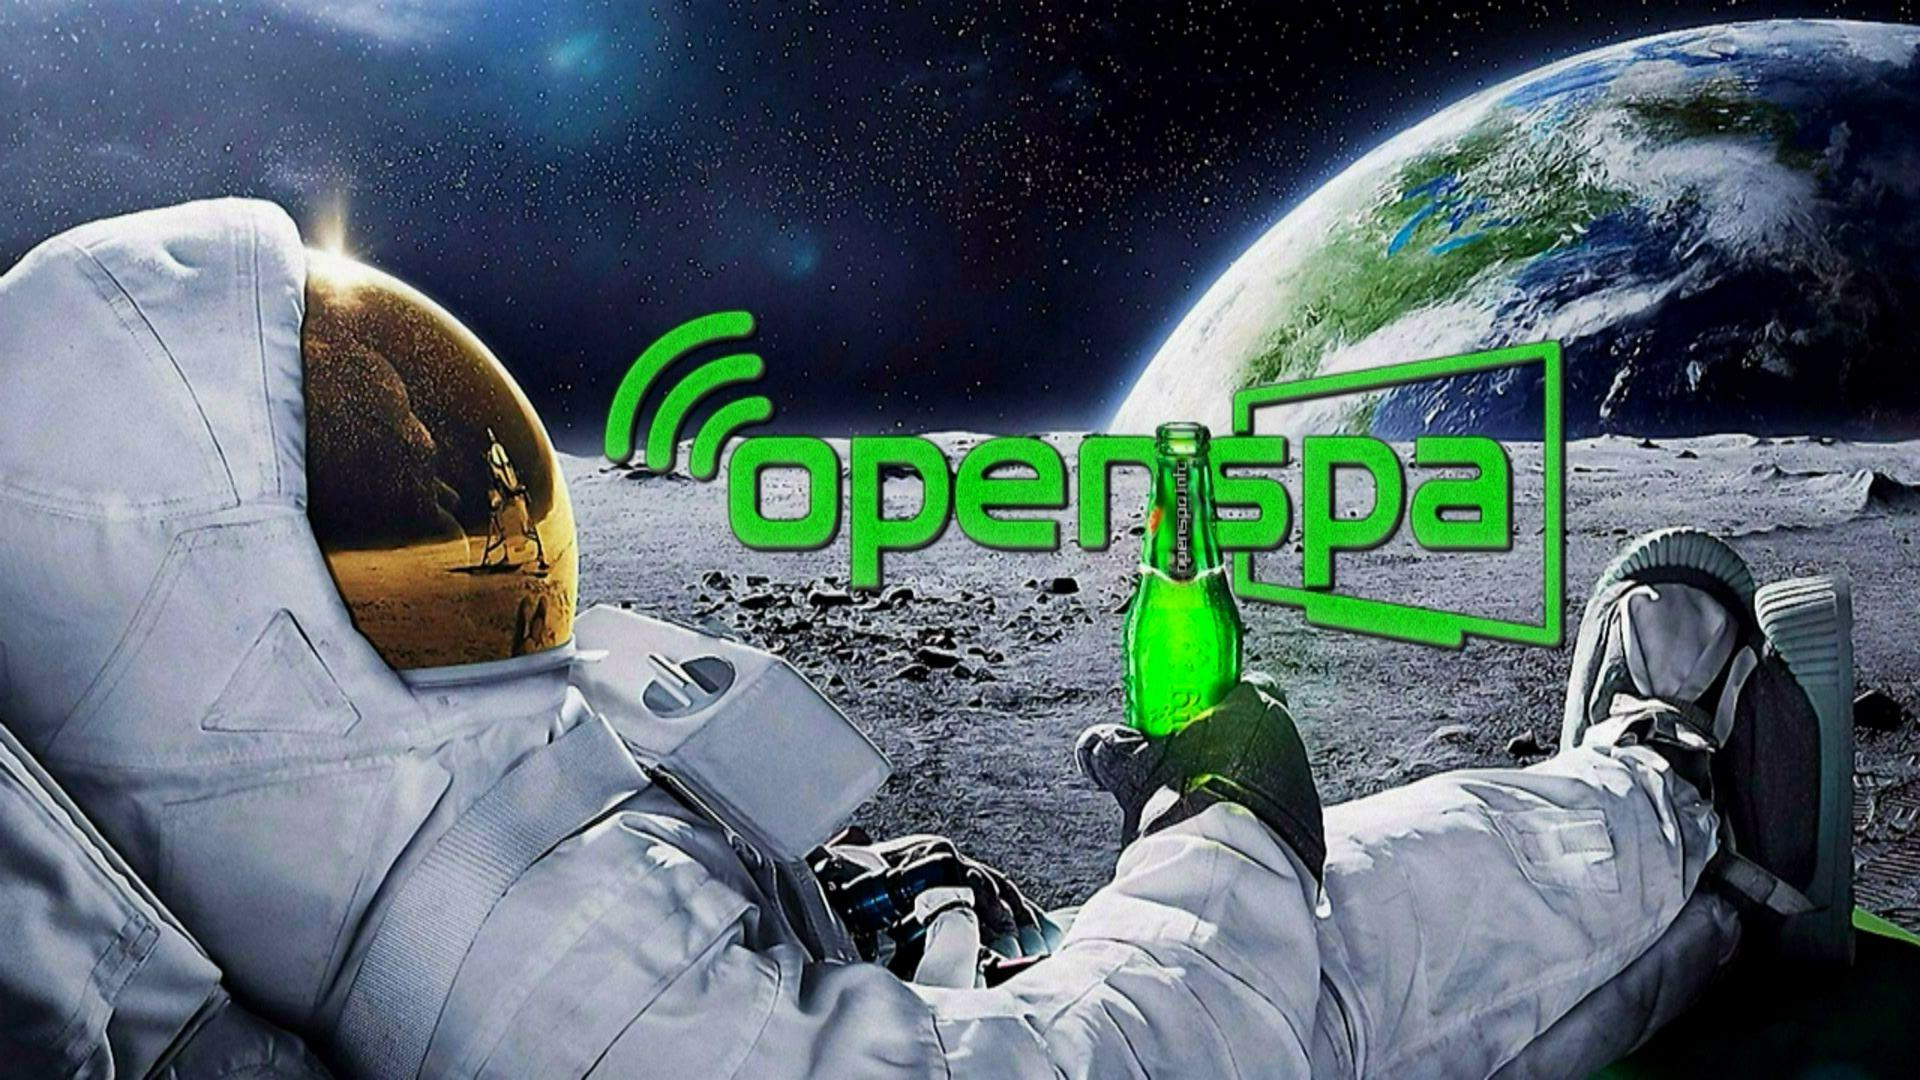 openspa.jpg